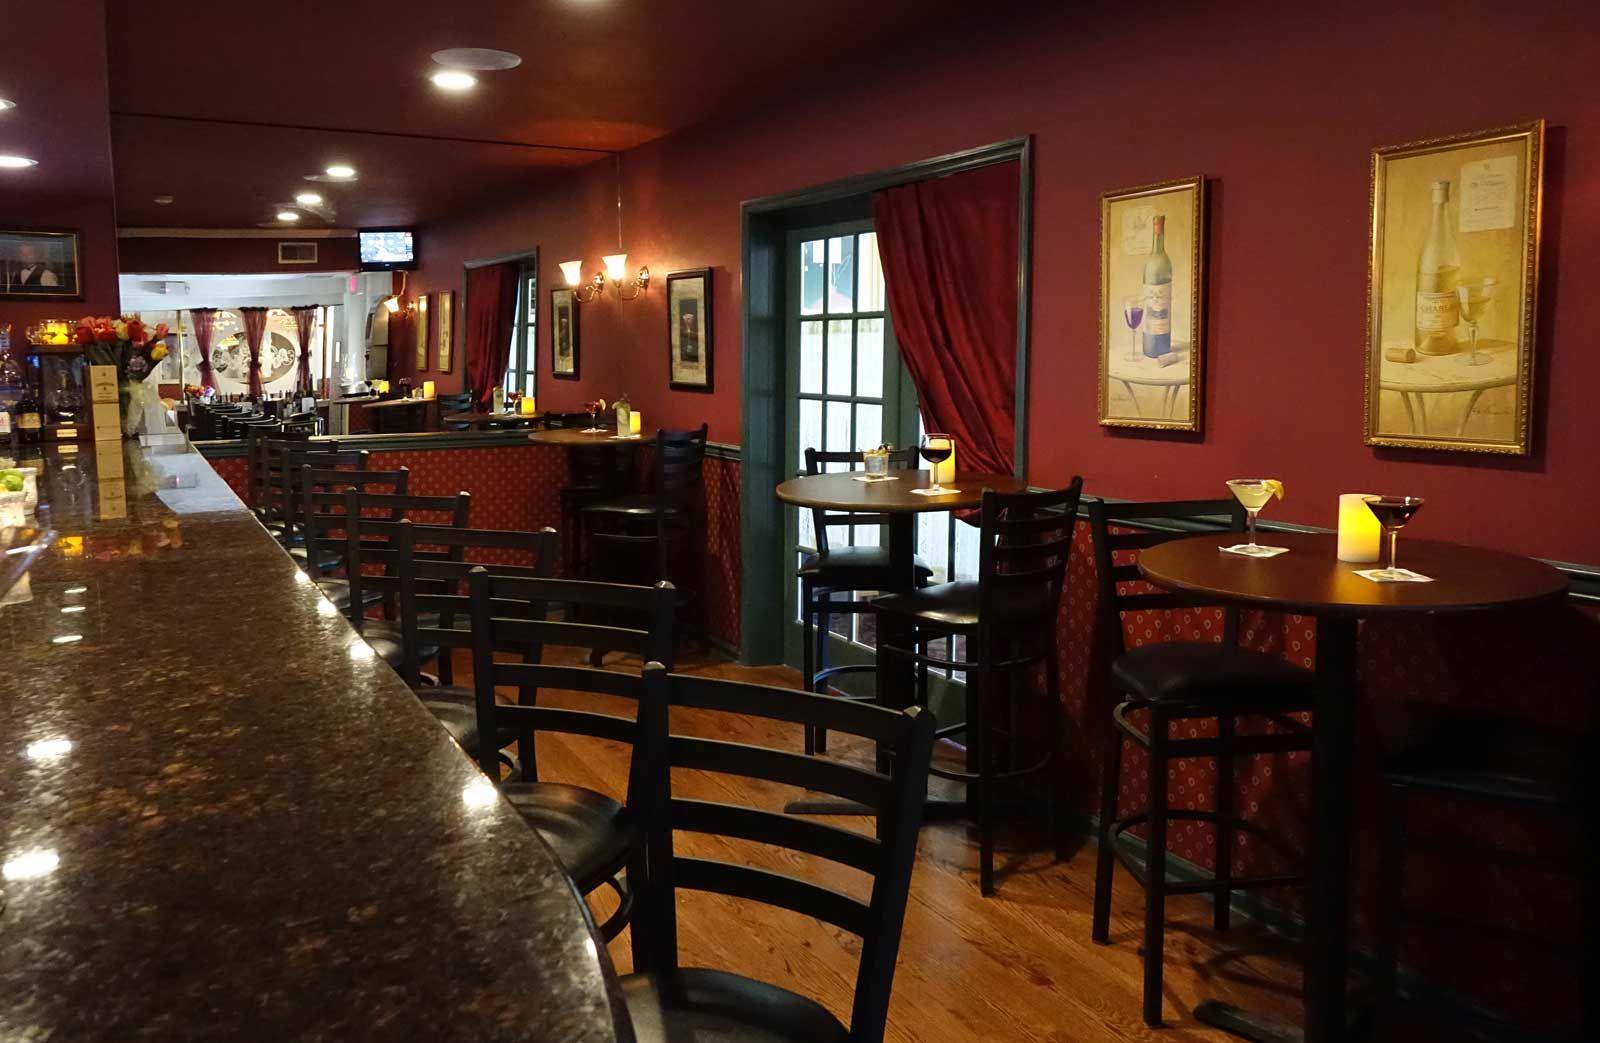 Restaurants In Paic County Nj The Village Inn